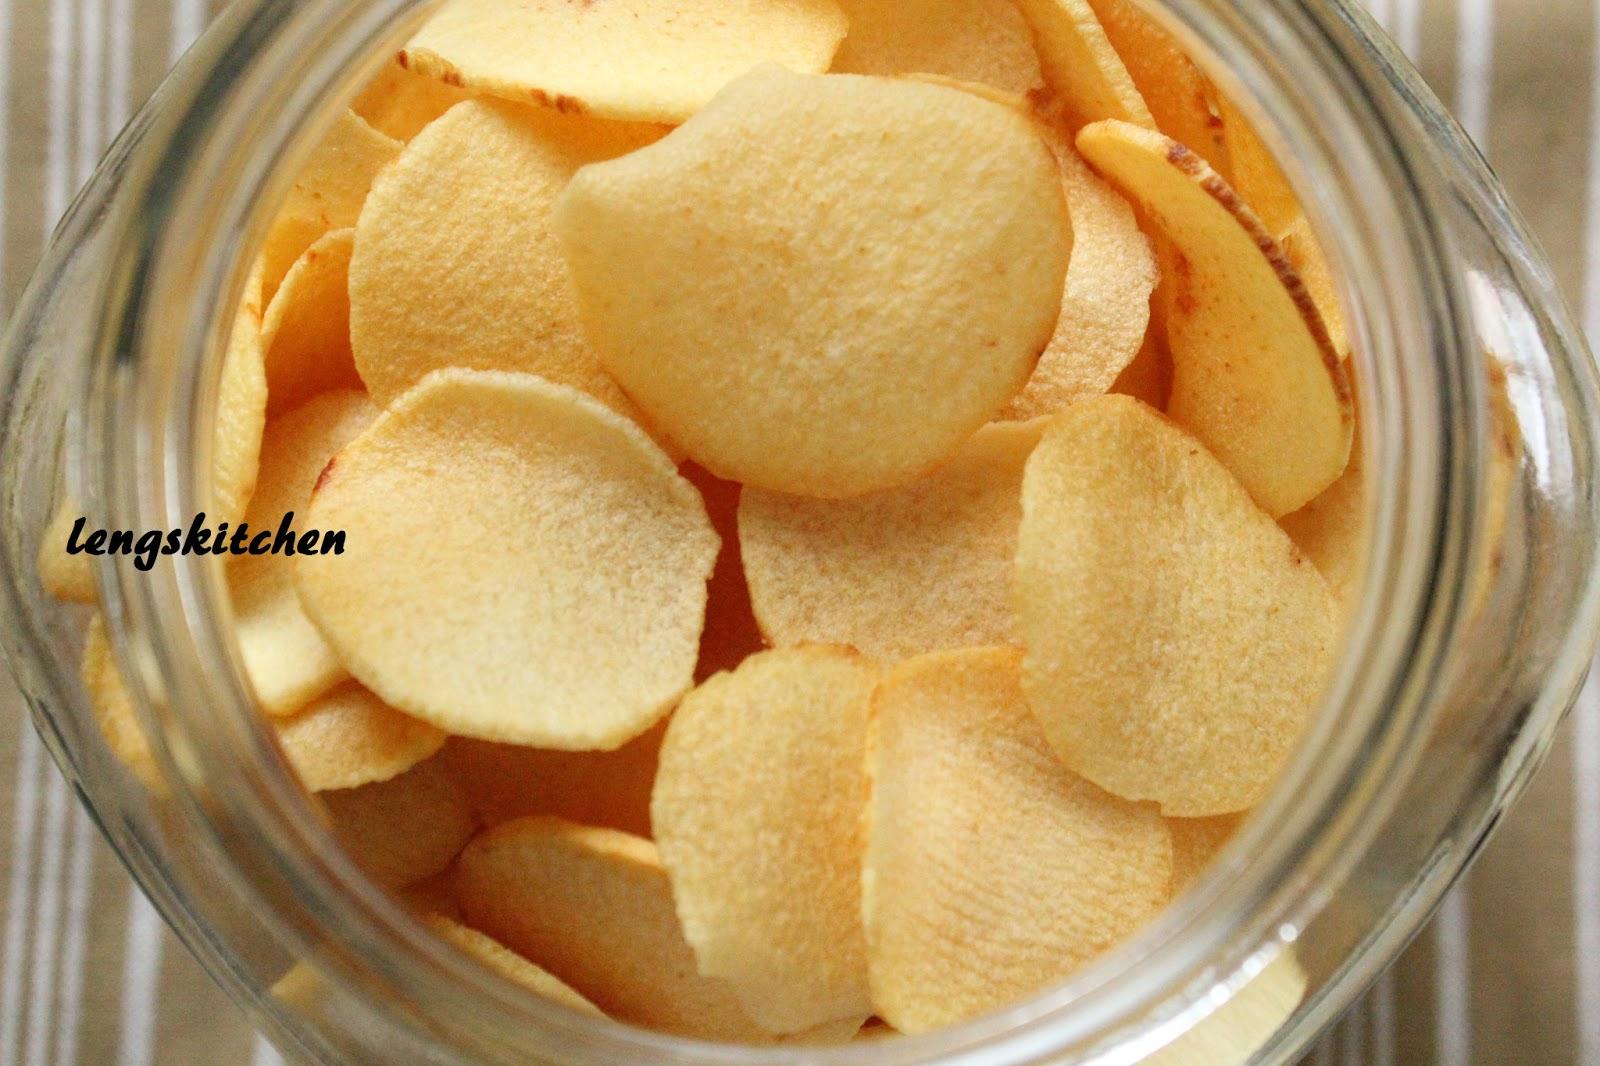 Kitchen Trim Modern Knobs Chaos: Ngaku (arrowhead) Chips 炸芽菇饼 - Chinese New ...